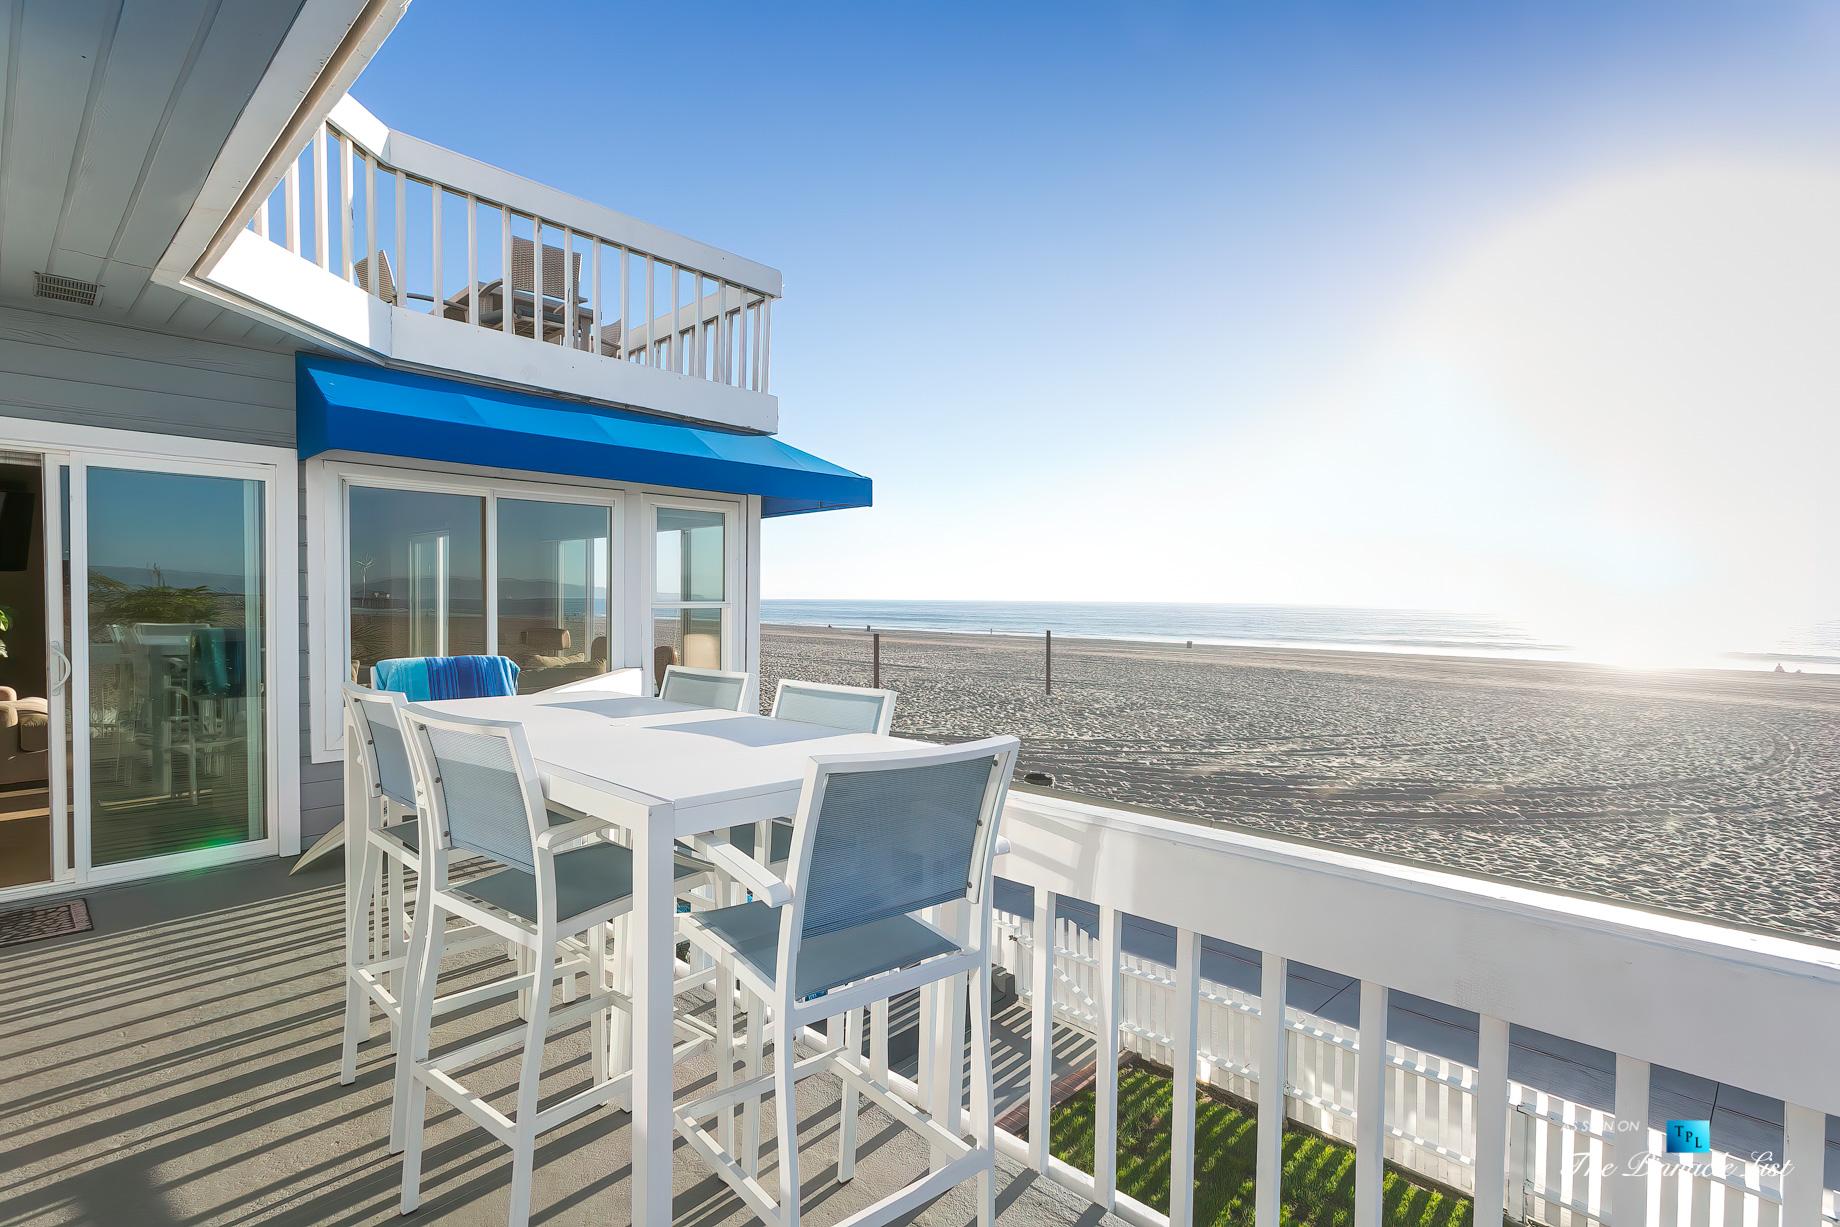 3500 The Strand, Hermosa Beach, CA, USA - Beachfront Deck – Luxury Real Estate – Original 90210 Beach House - Oceanfront Home